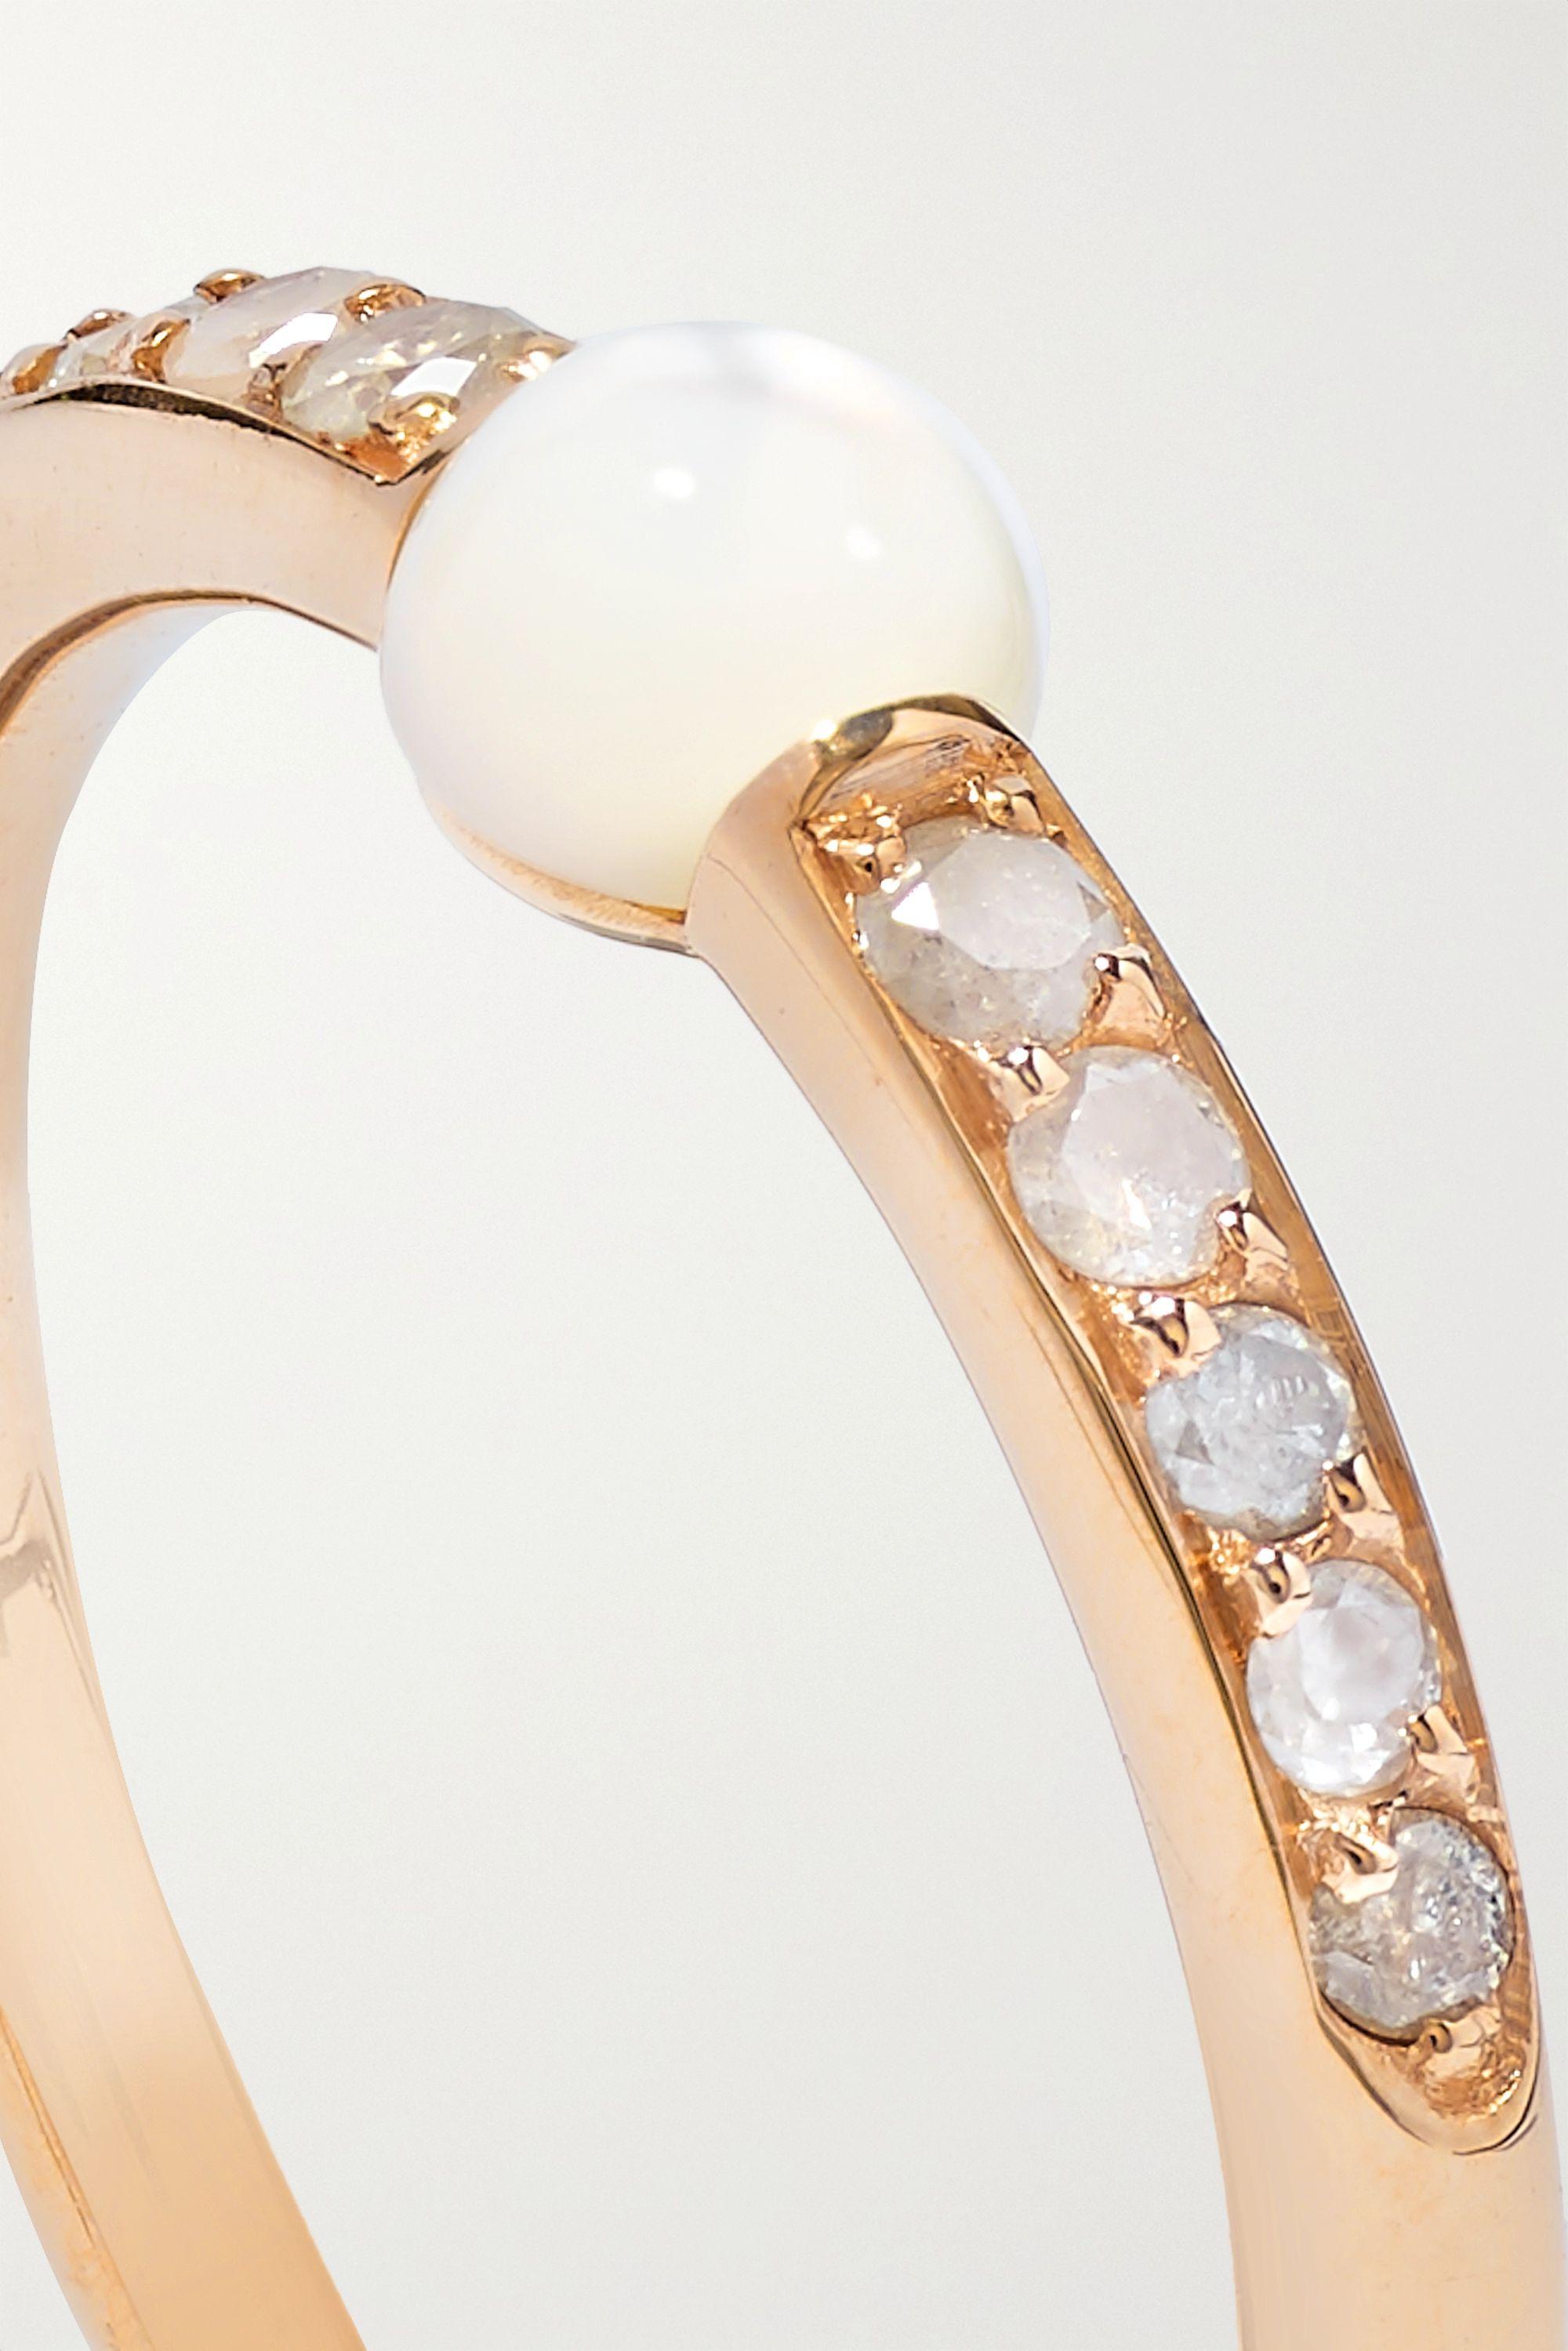 Pomellato M'ama non M'ama 18-karat rose gold, mother-of-pearl and diamond ring